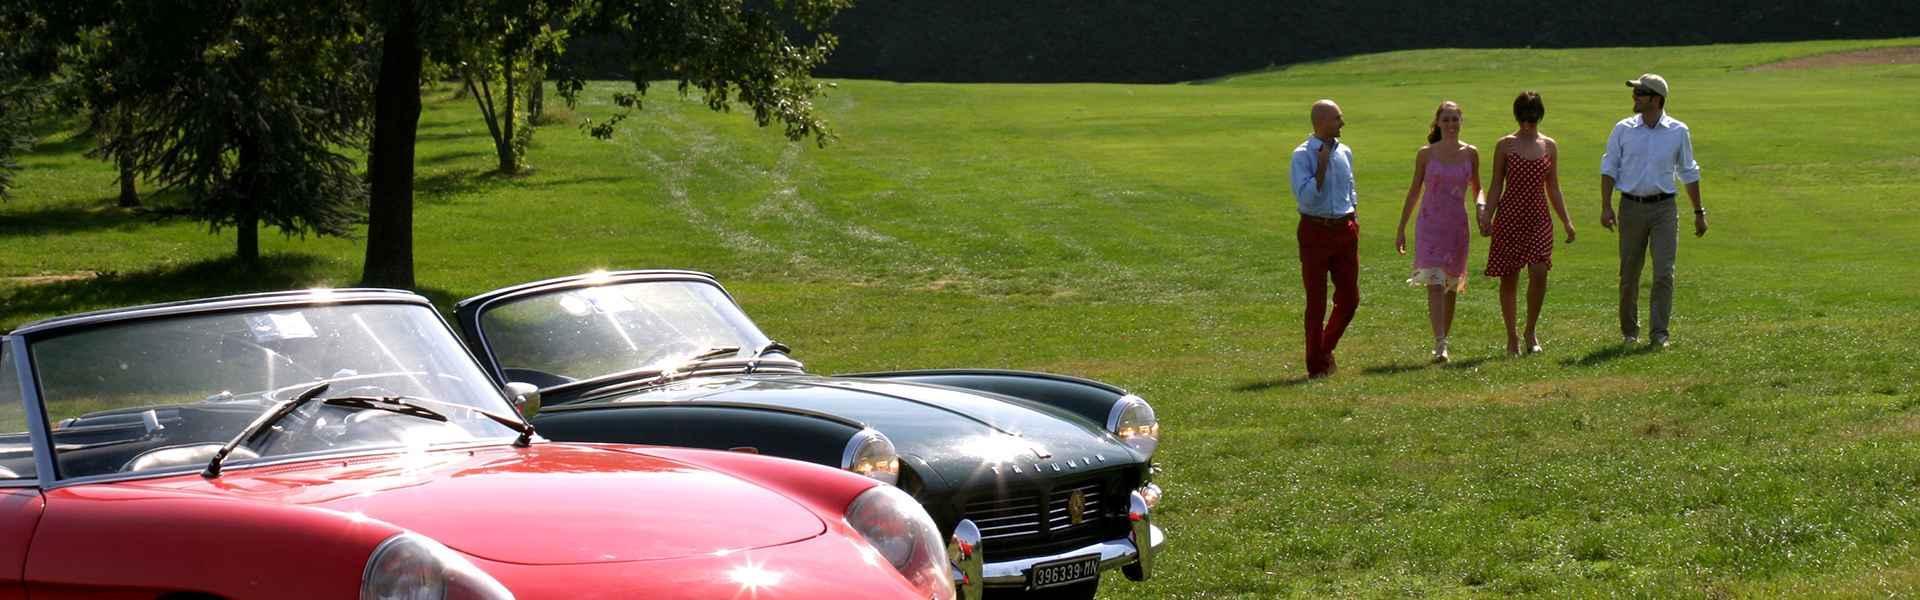 Slow drive classic cars